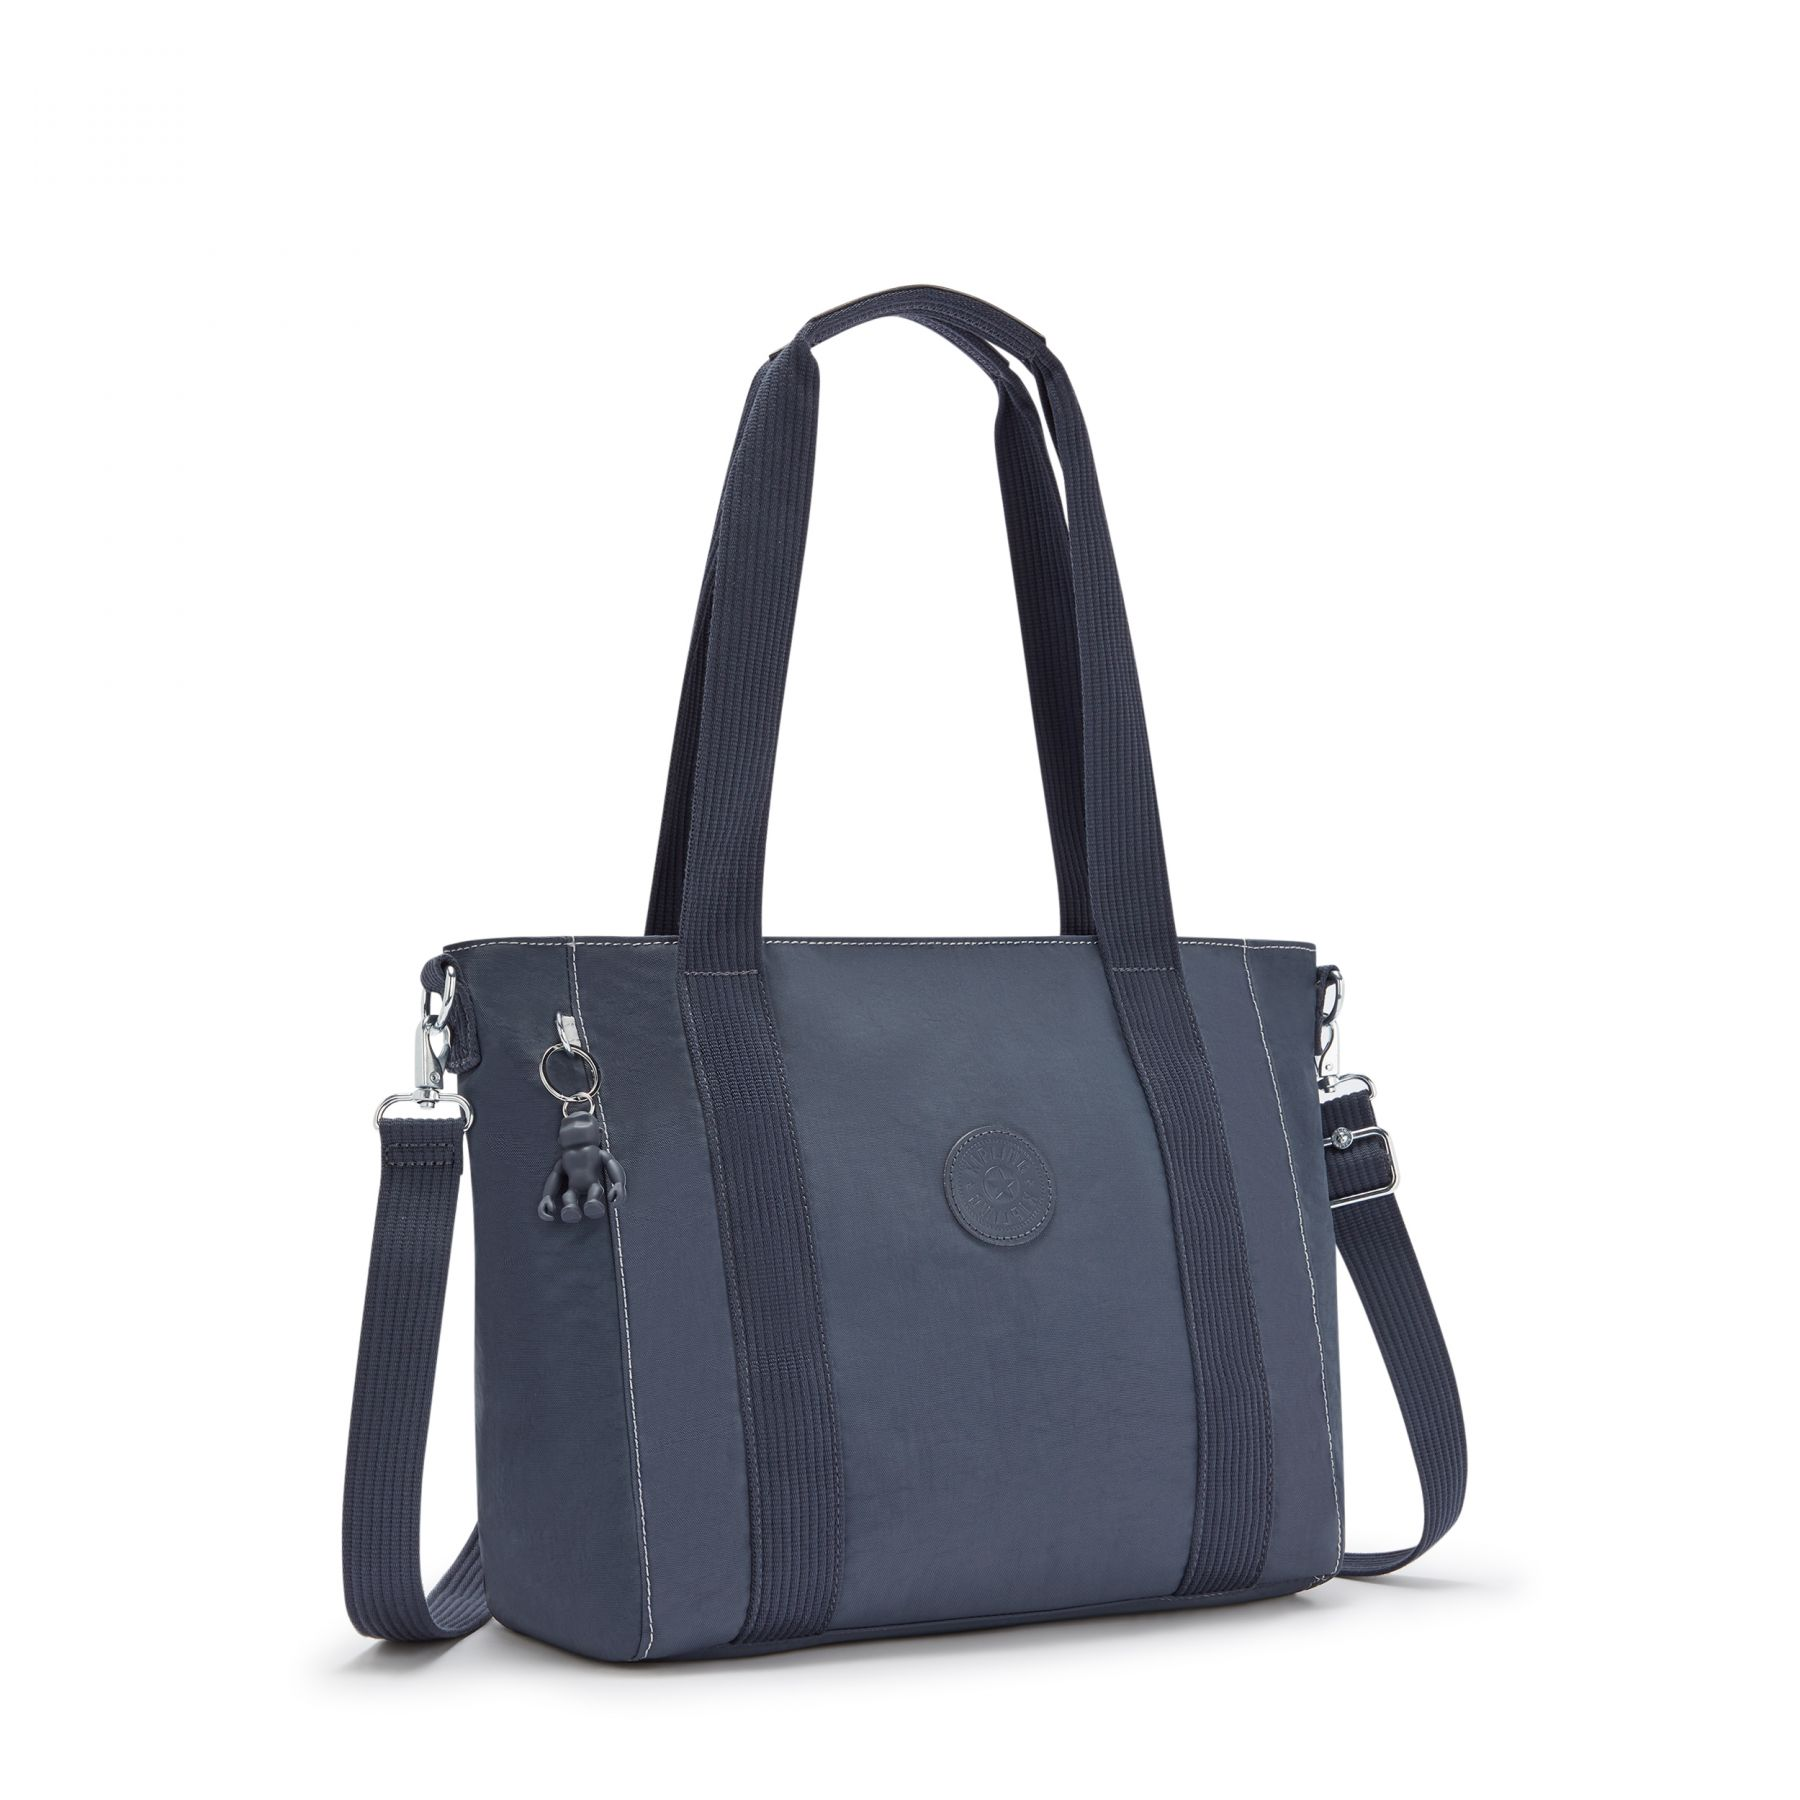 ASSENI S BAGS by Kipling